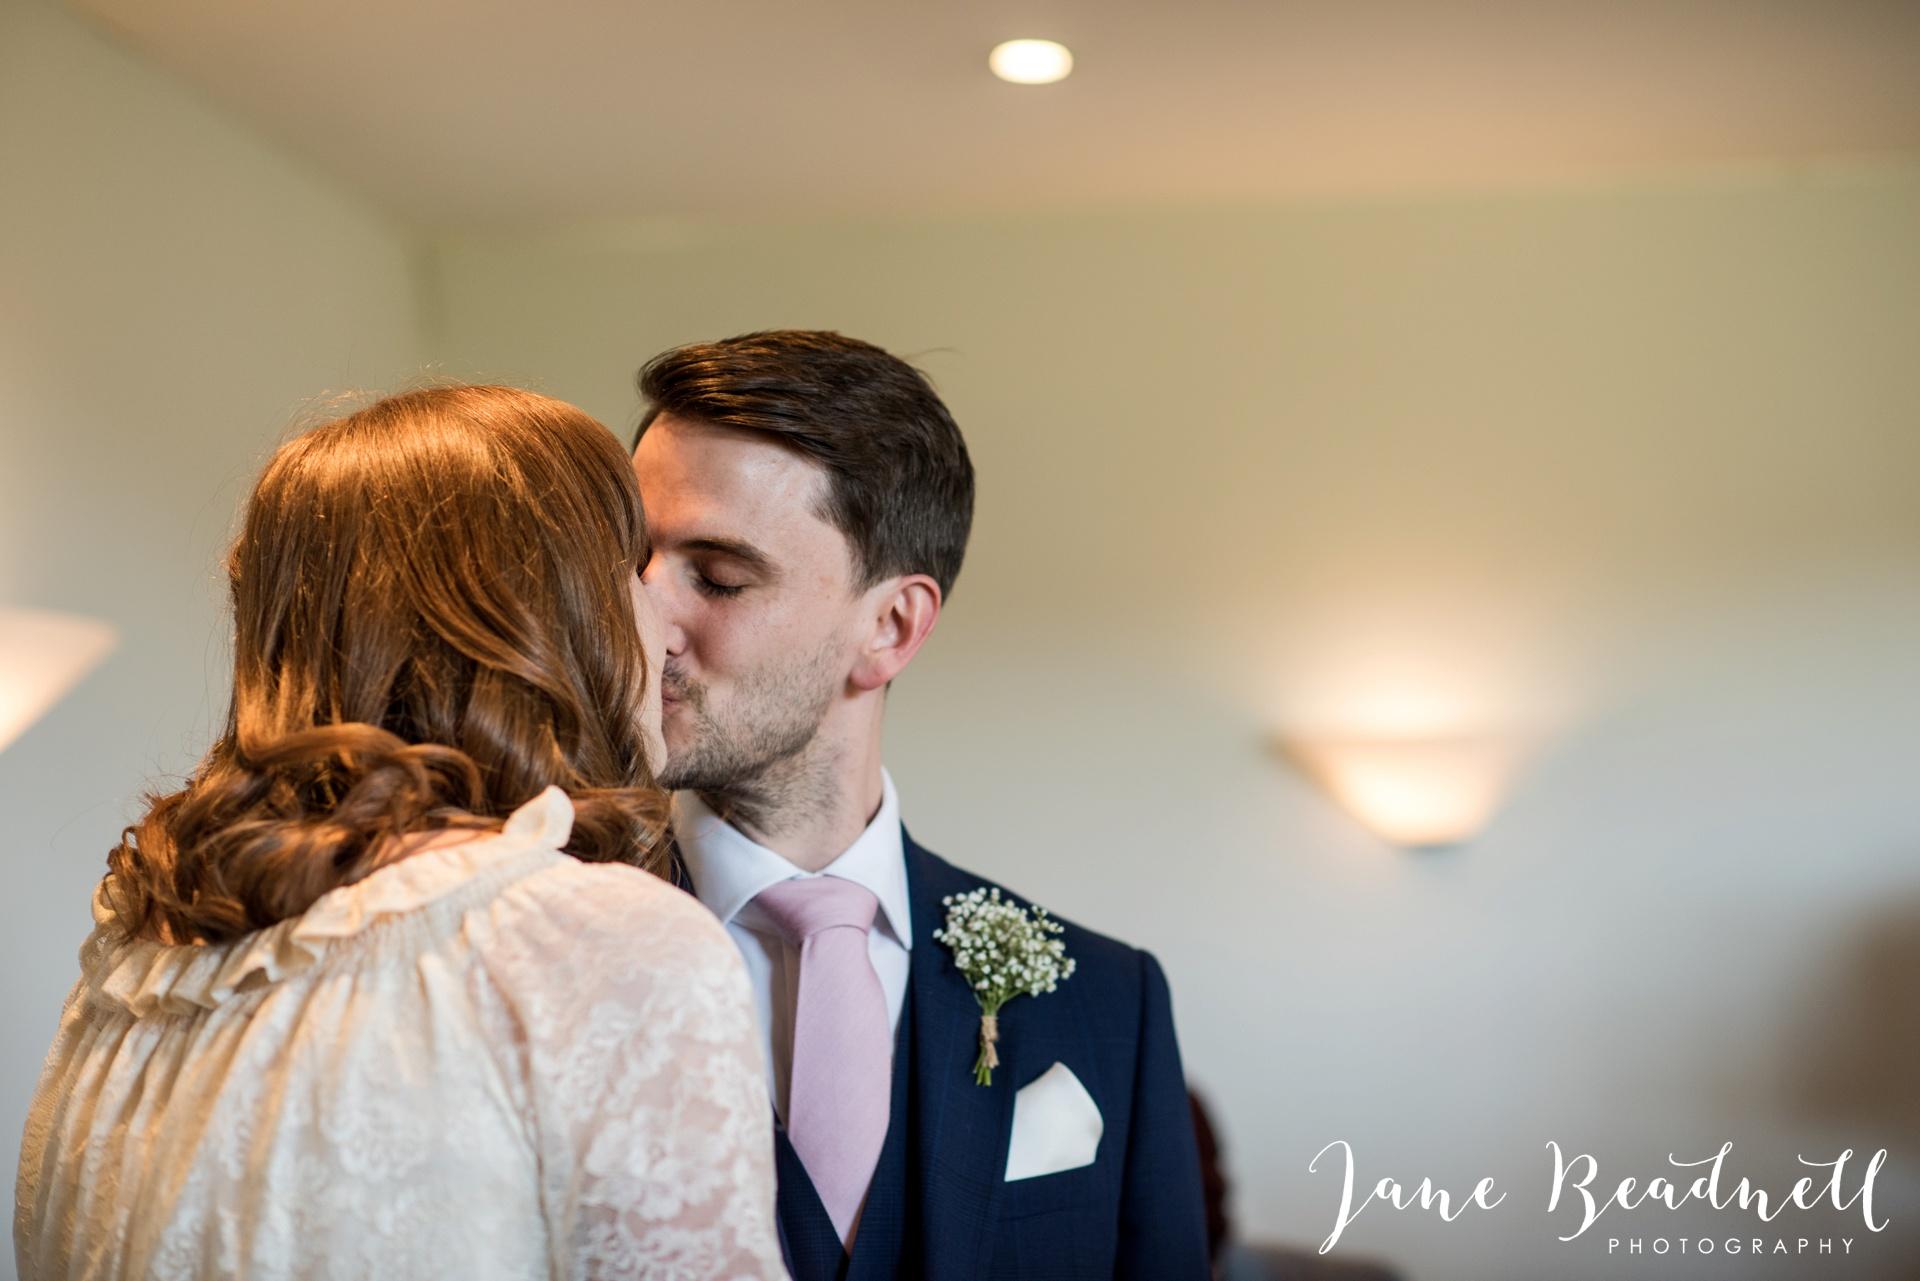 Jane Beadnell fine art wedding photographer The Cheerful Chilli Barn Otley_0021